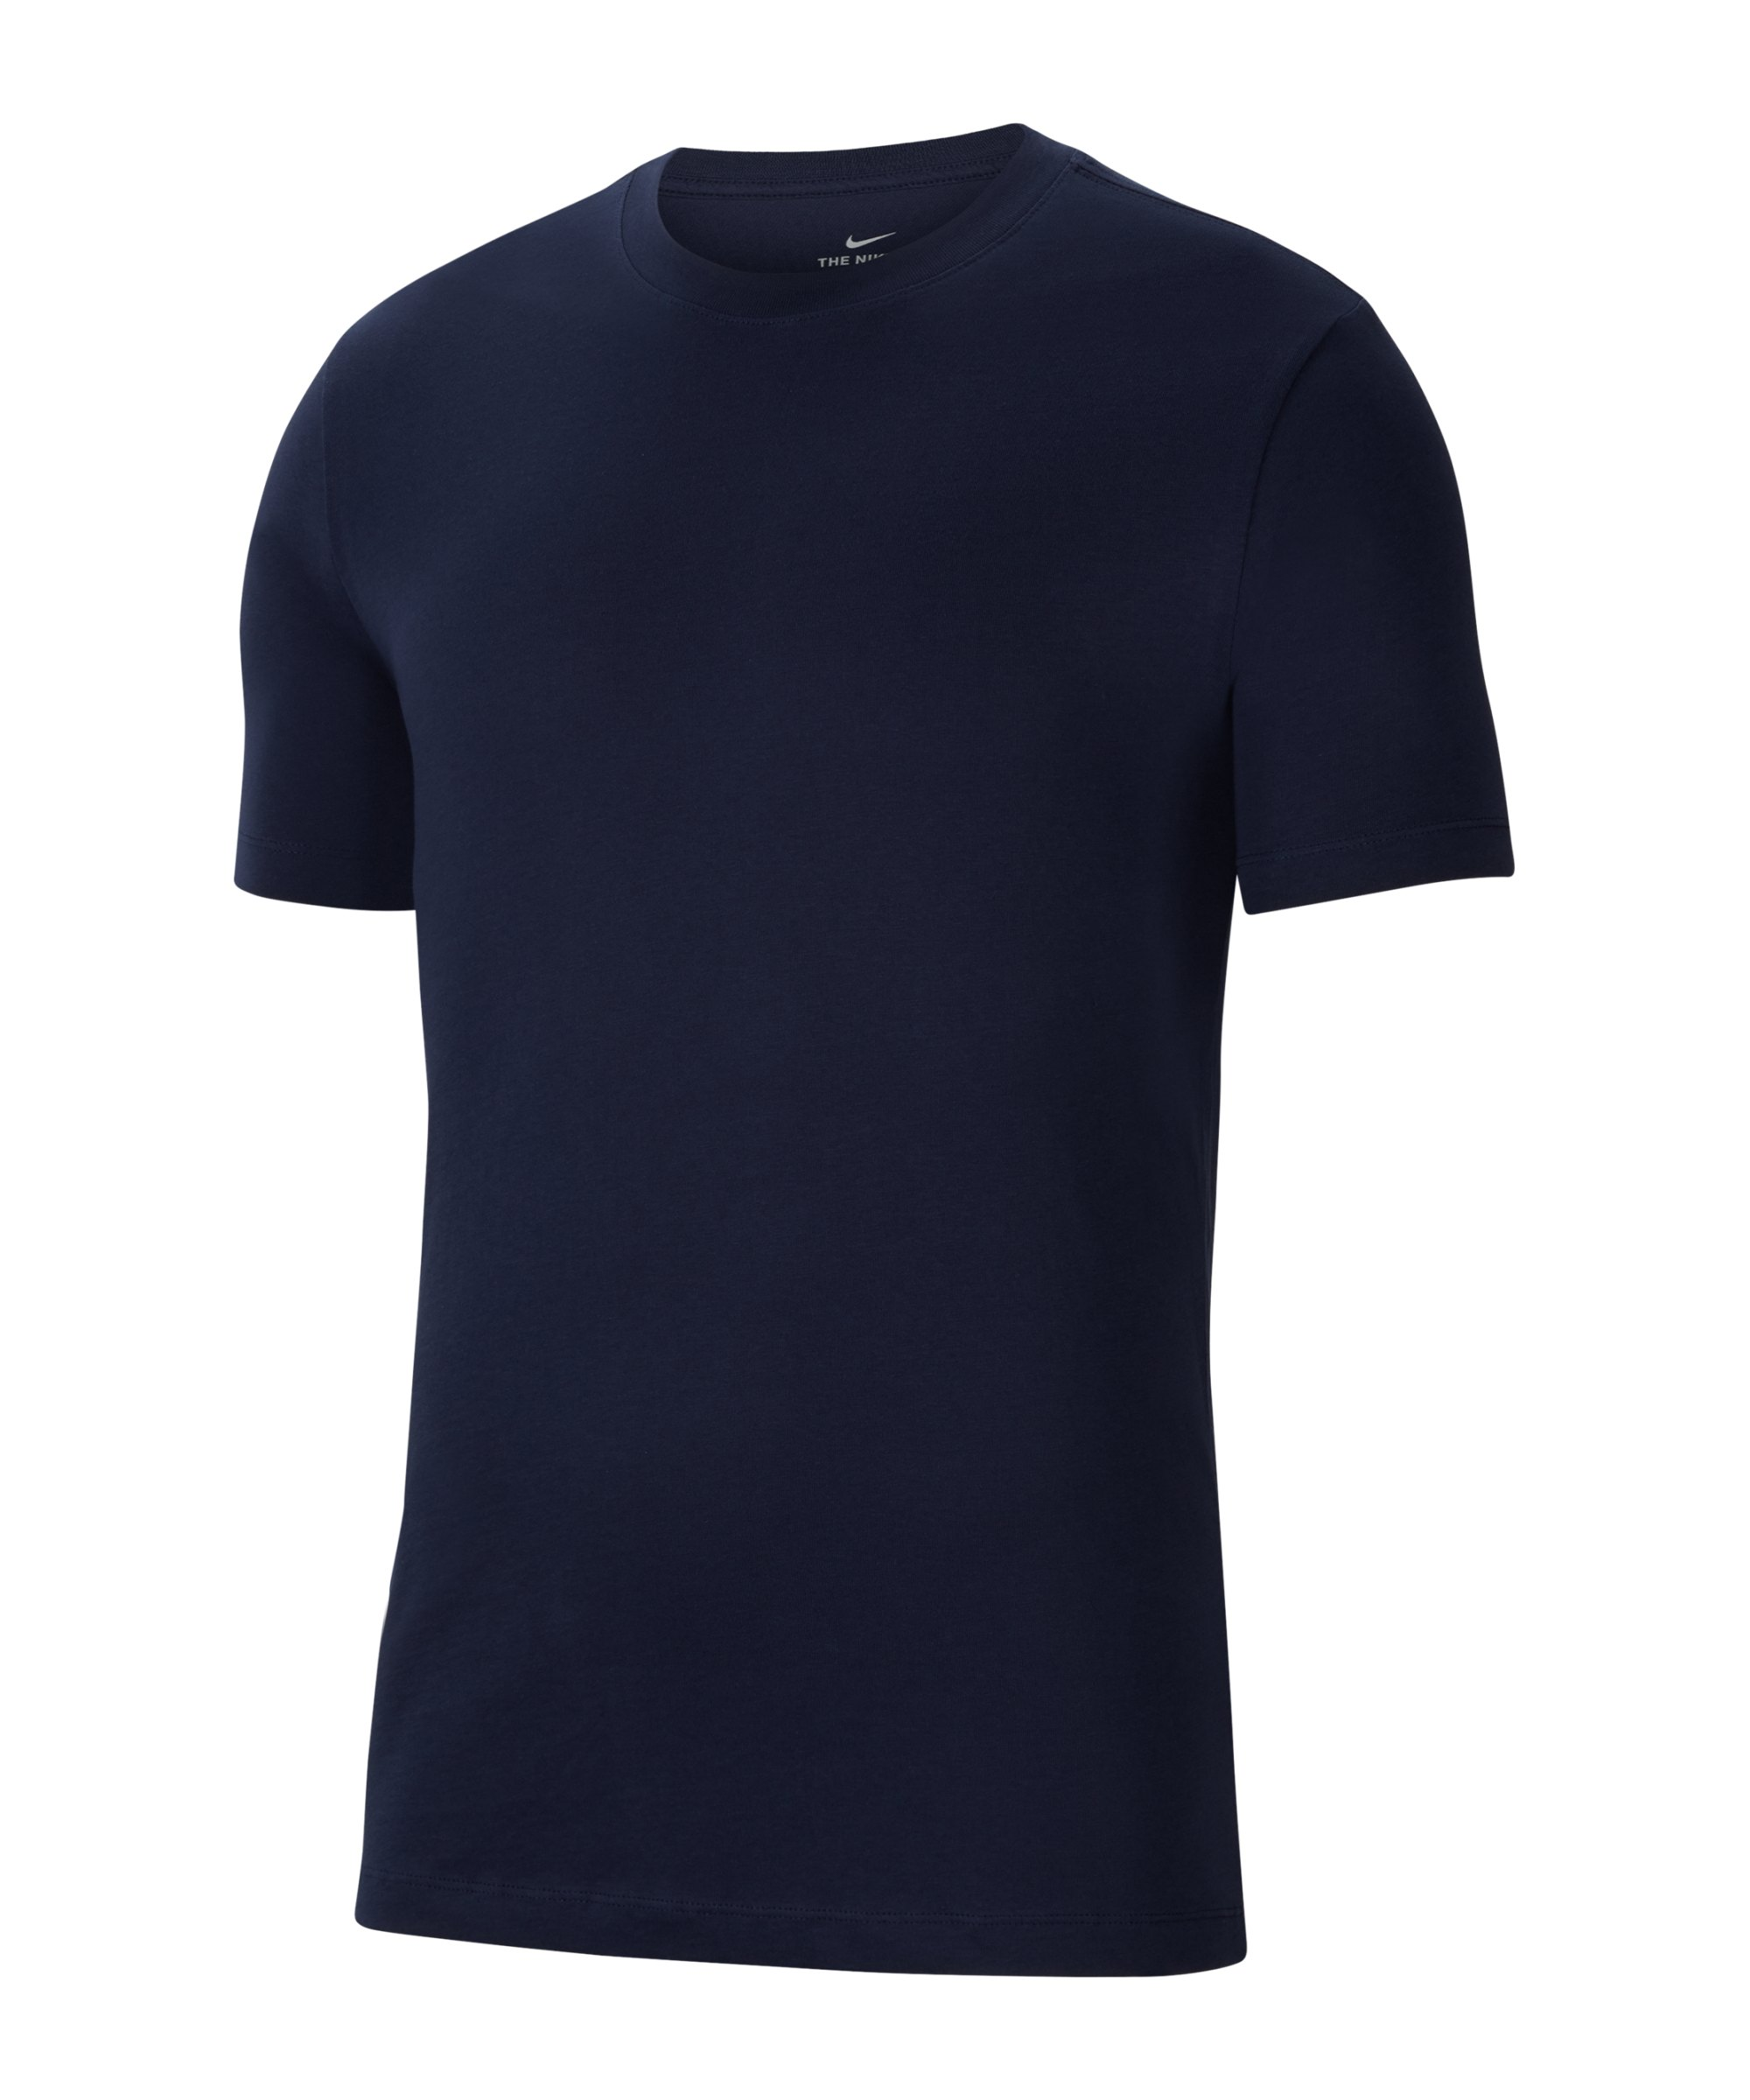 Nike Park 20 T-Shirt Blau Weiss F451 - blau